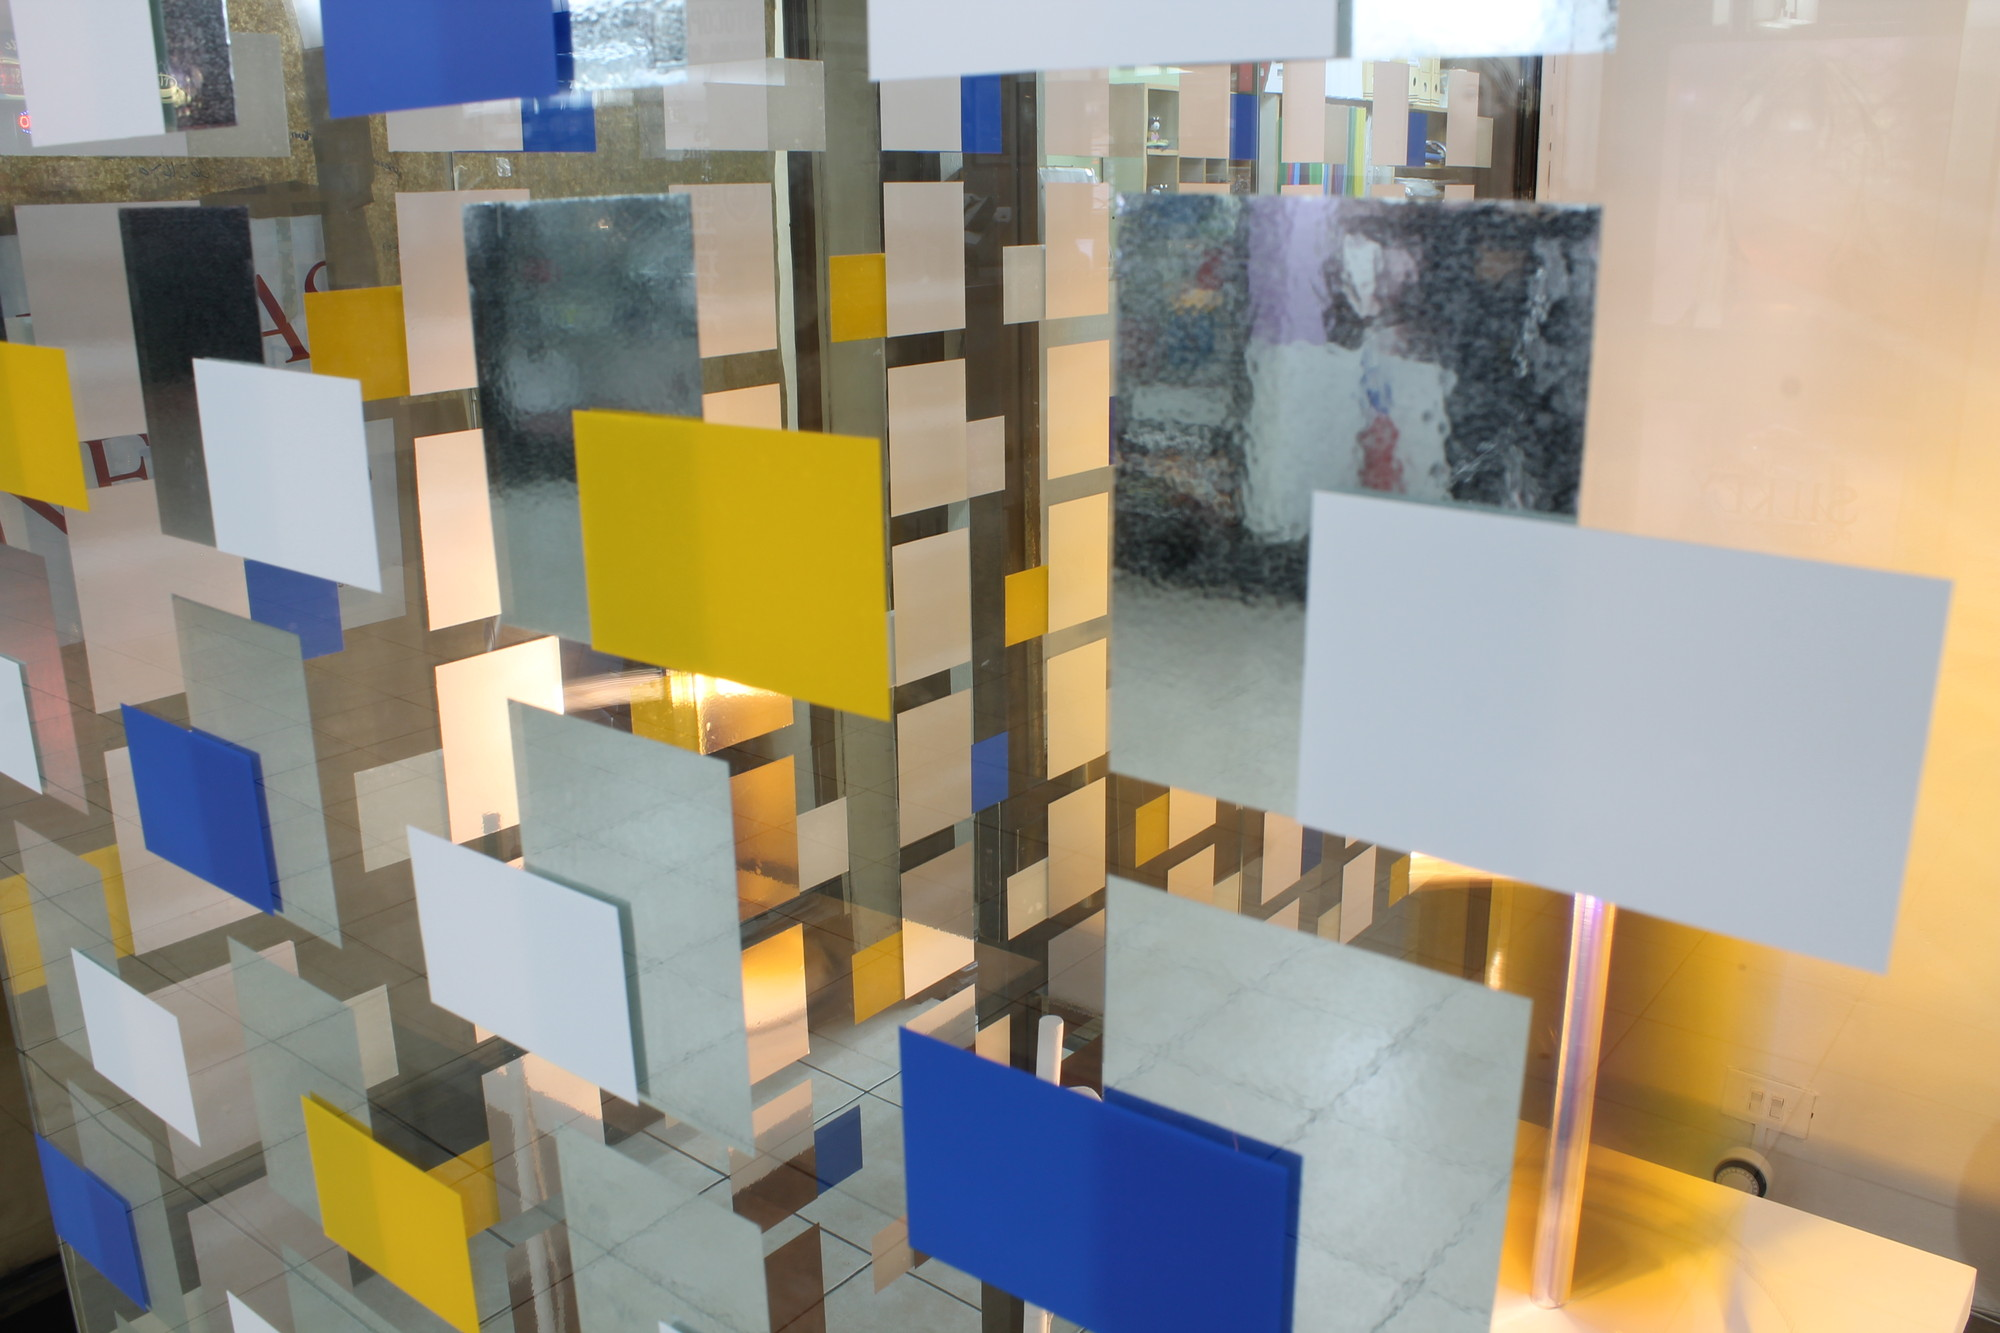 Exposici n movimiento moderno de leonardo portus - Movimiento moderno ...